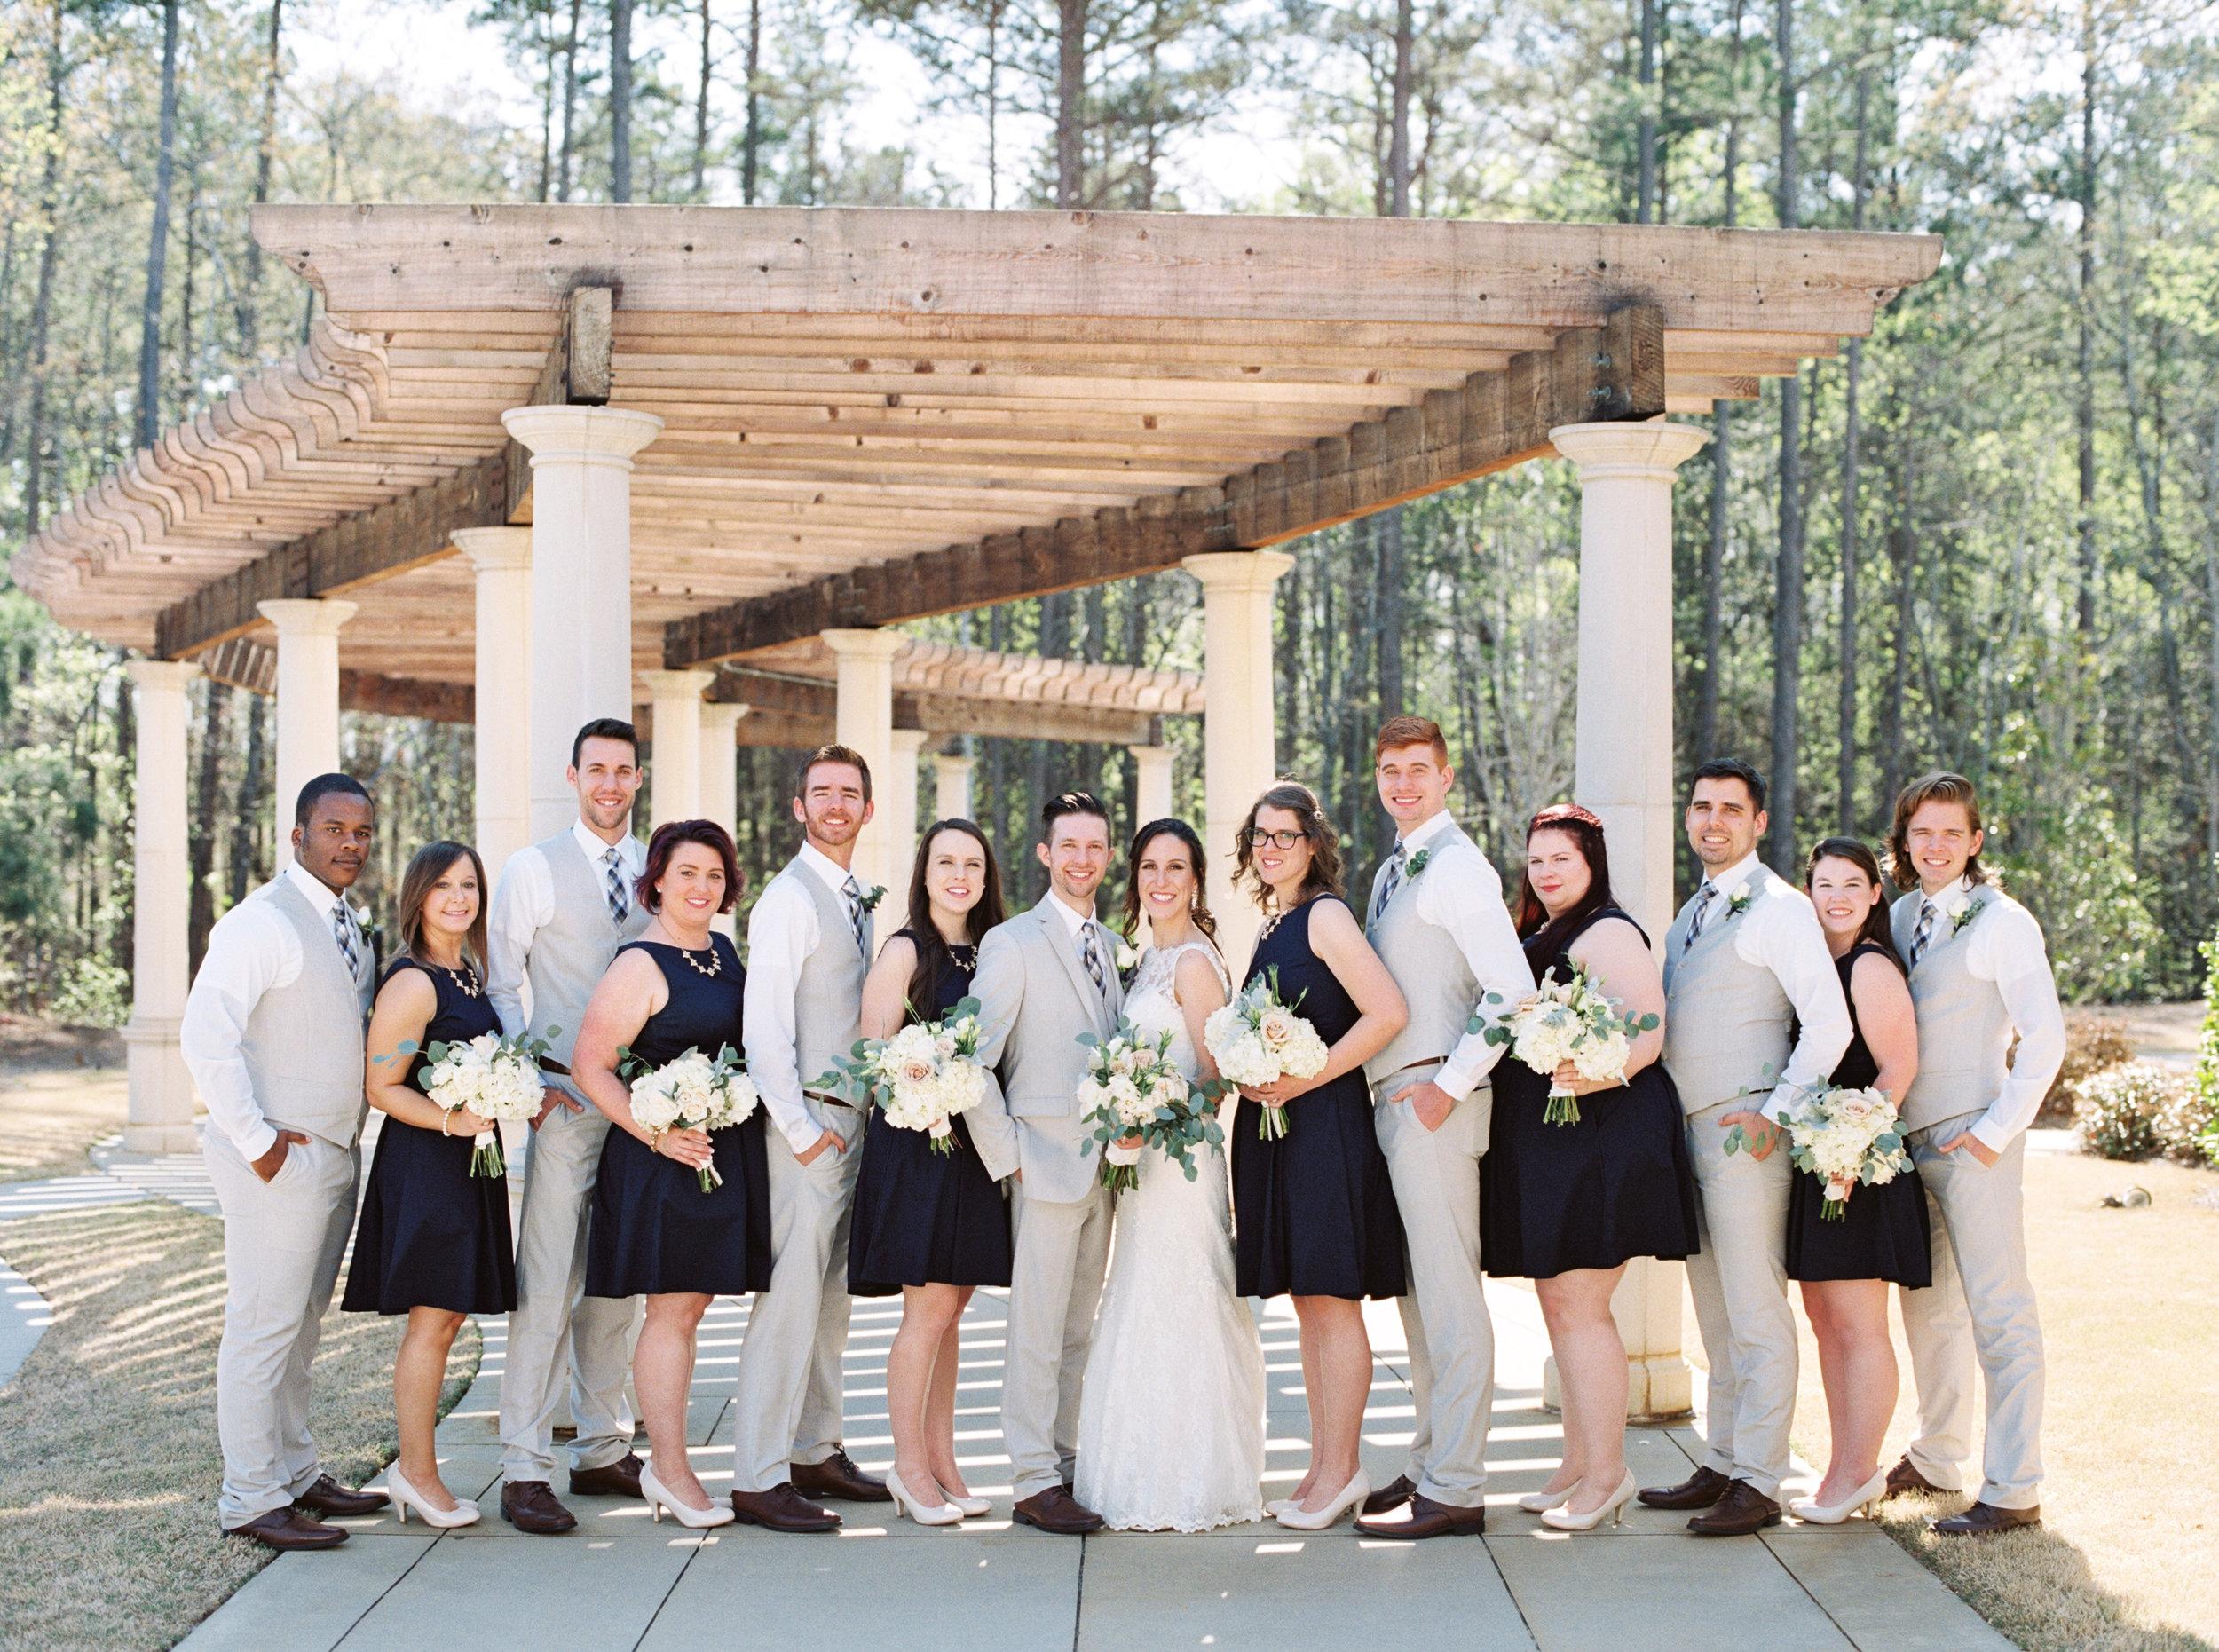 Ashton_Gardens_Atlanta_Georgia_Wedding_Fine_Art_Film_Fallen_Photography_Katie_Gordon-229.jpg